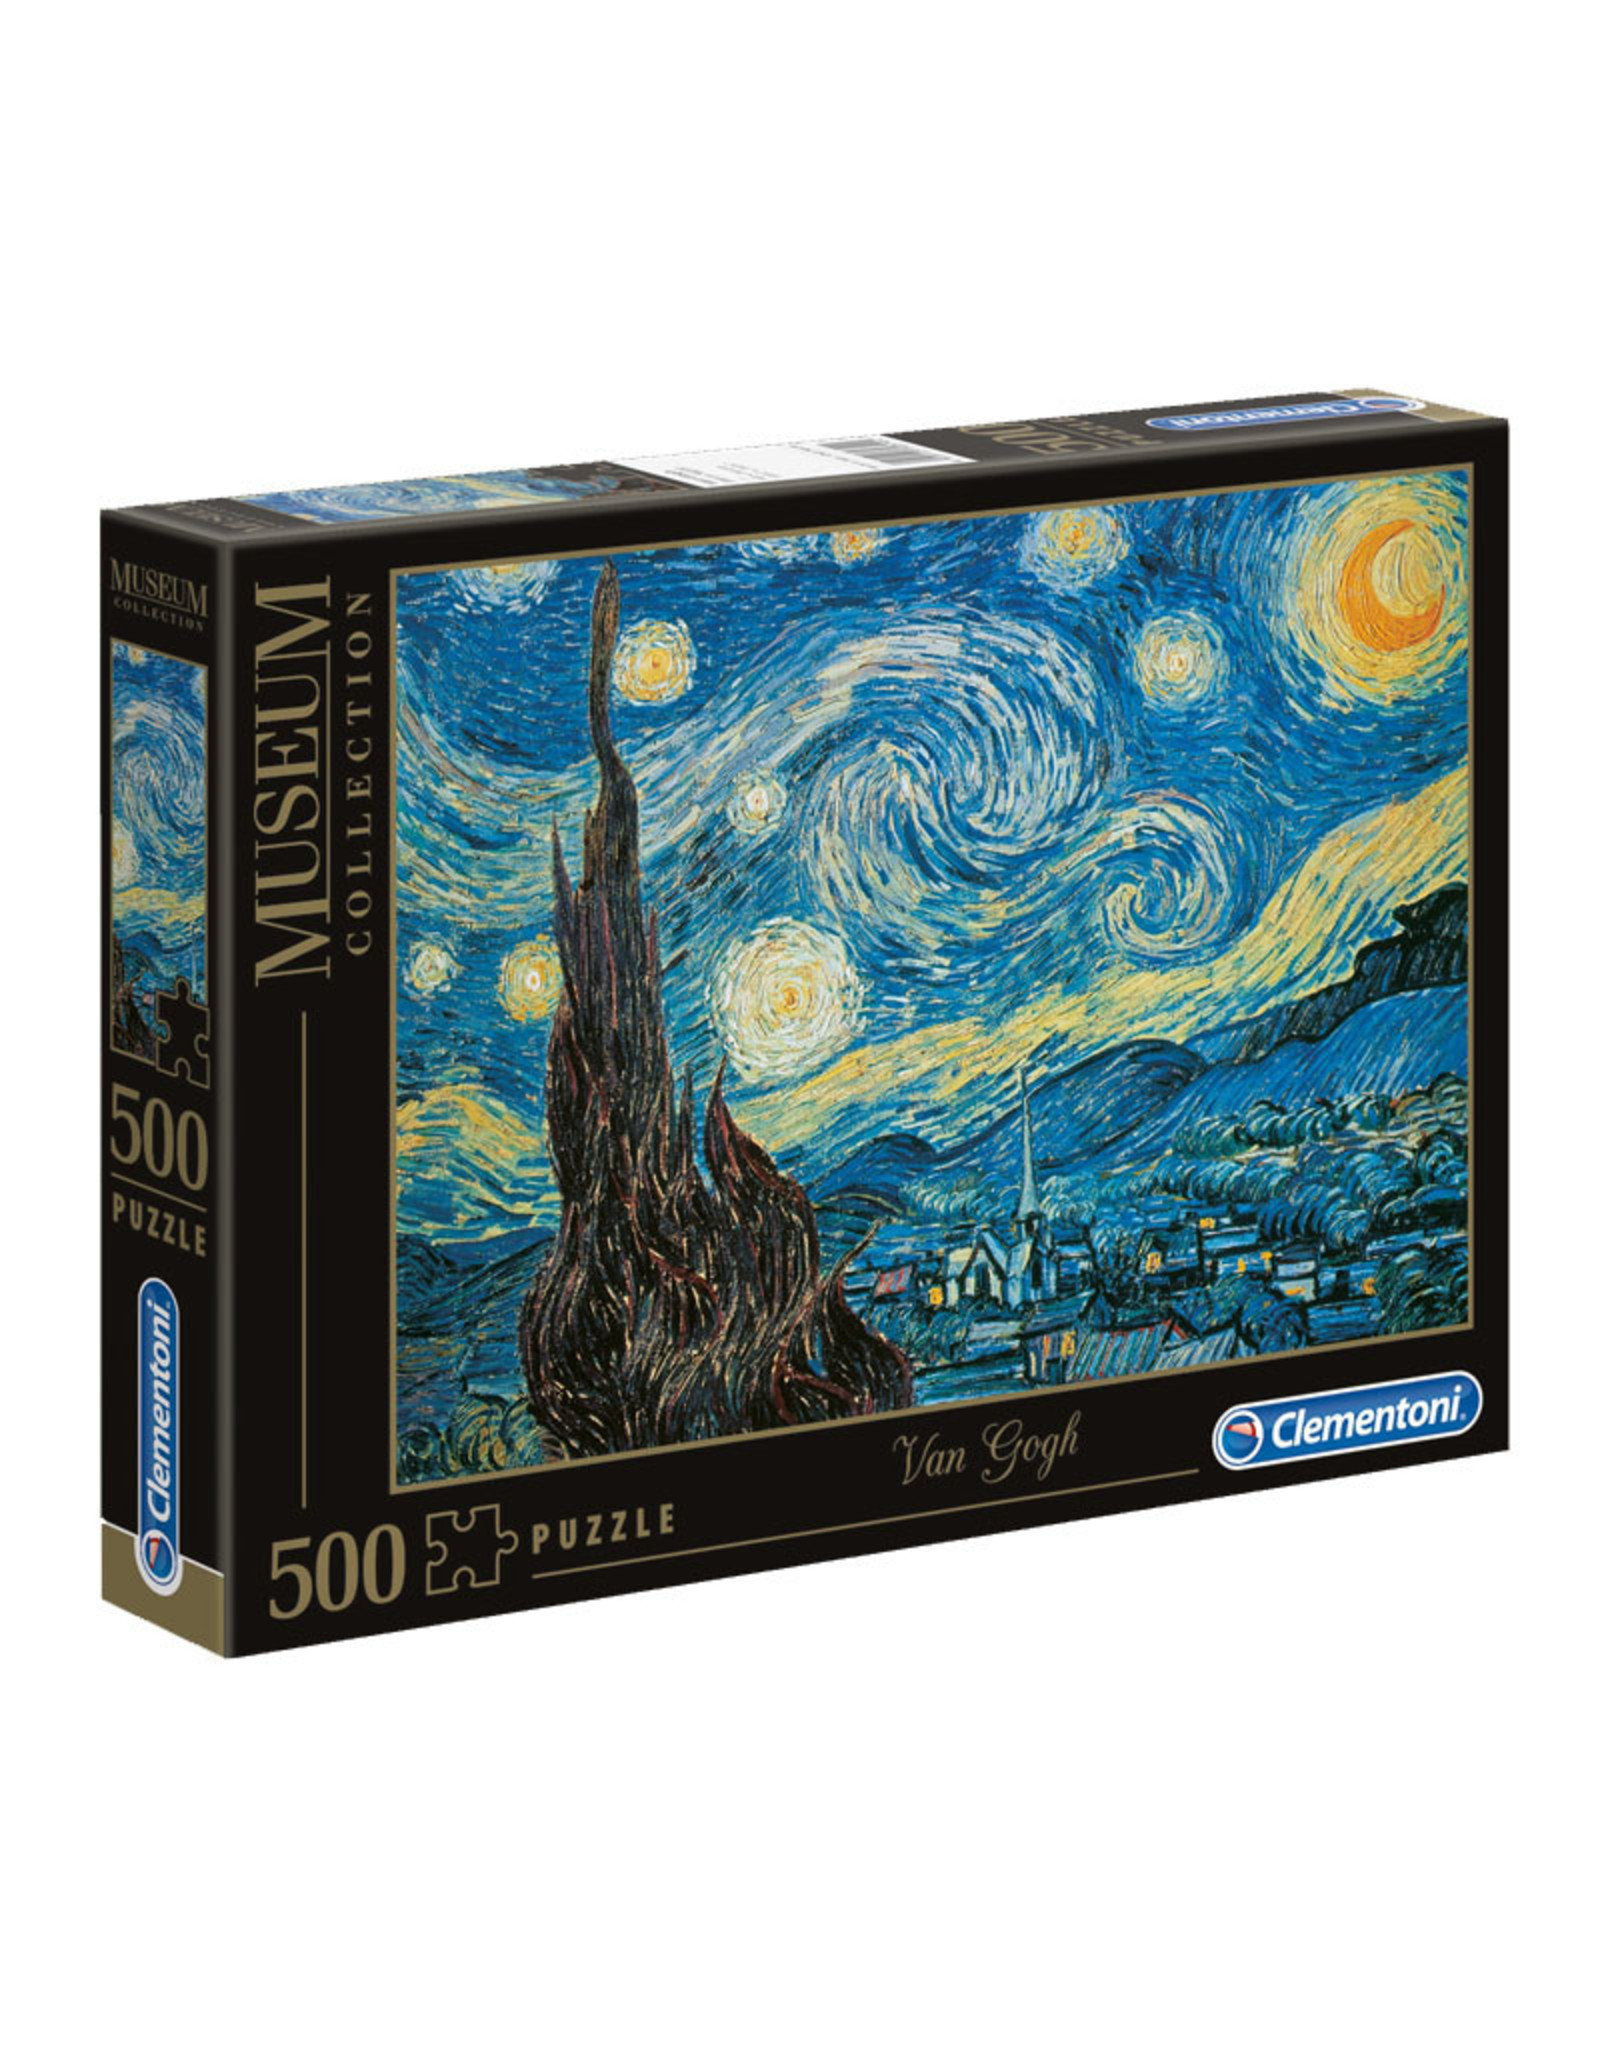 Clementoni Van Gogh Starry Night 500 PCS